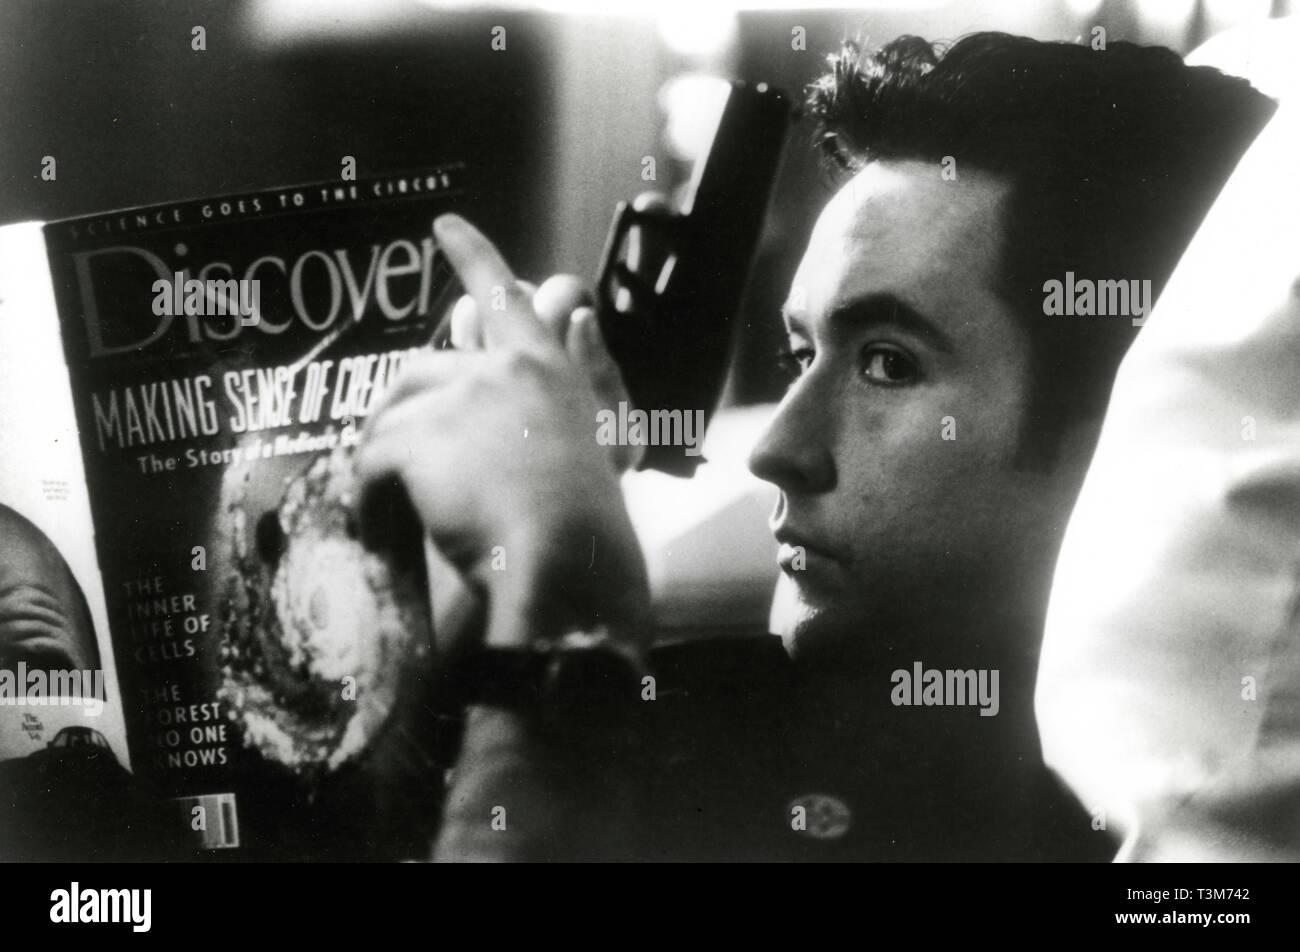 John Cusack in the movie Grosse Pointe Blank, 1997 - Stock Image